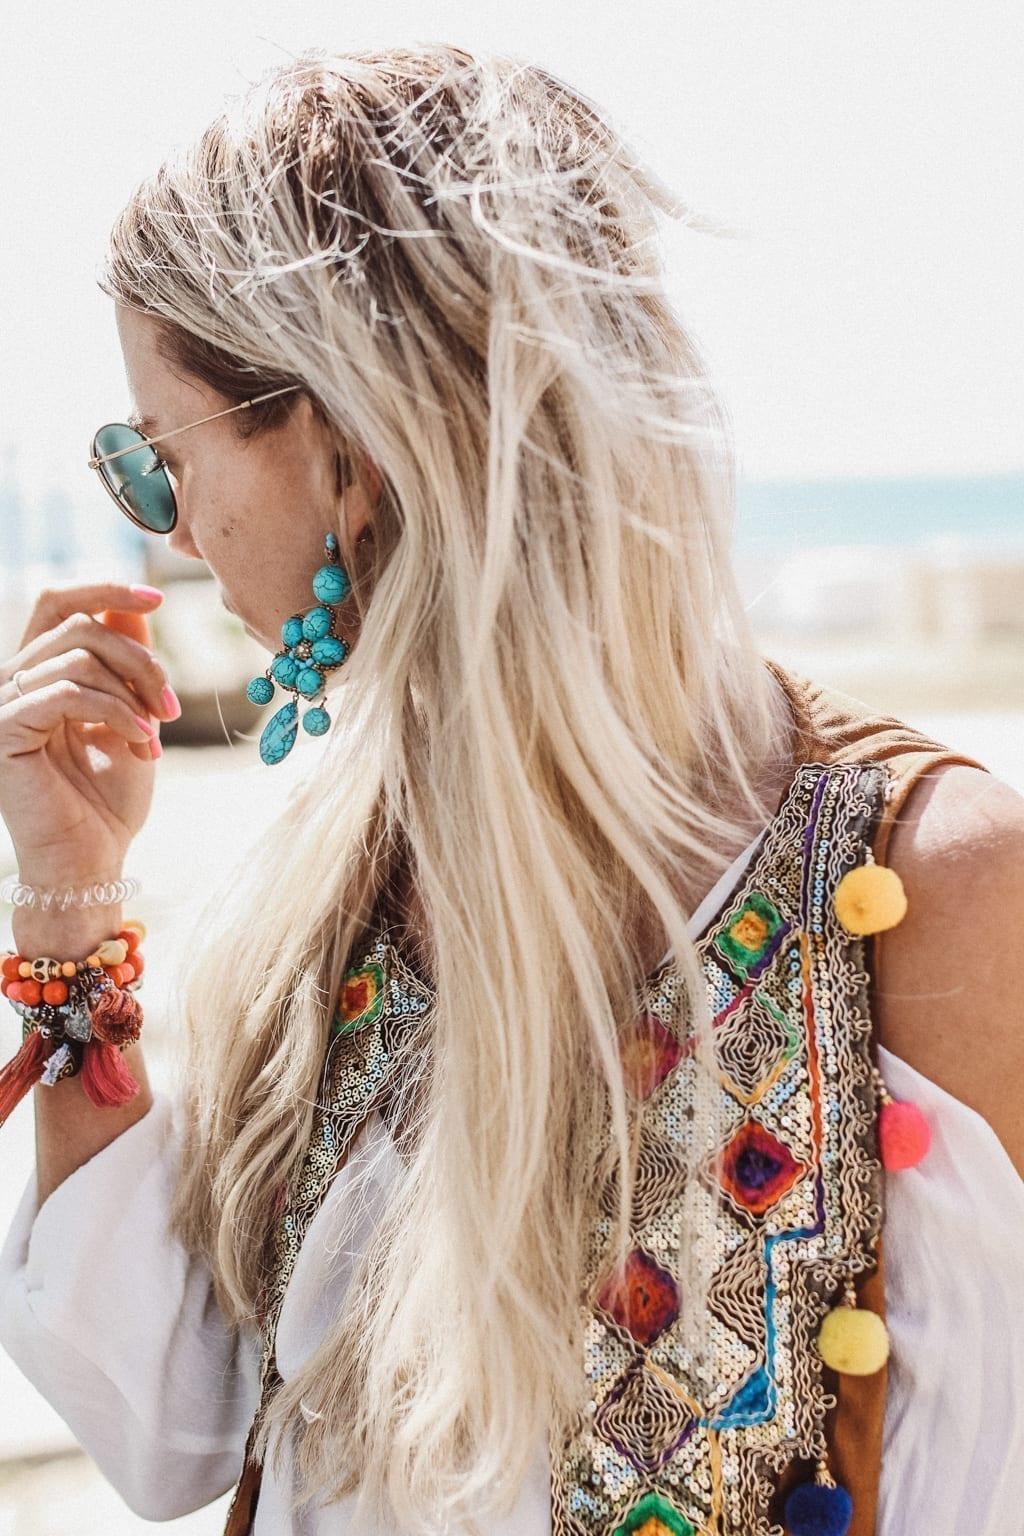 CK1605_Constantly-K-Karin-Kaswurm-Georg-Teigl-Ibiza-Holiday-Spain-Blog-Street-Style-Fashion-Boho-Chic-Beach-Style-7747